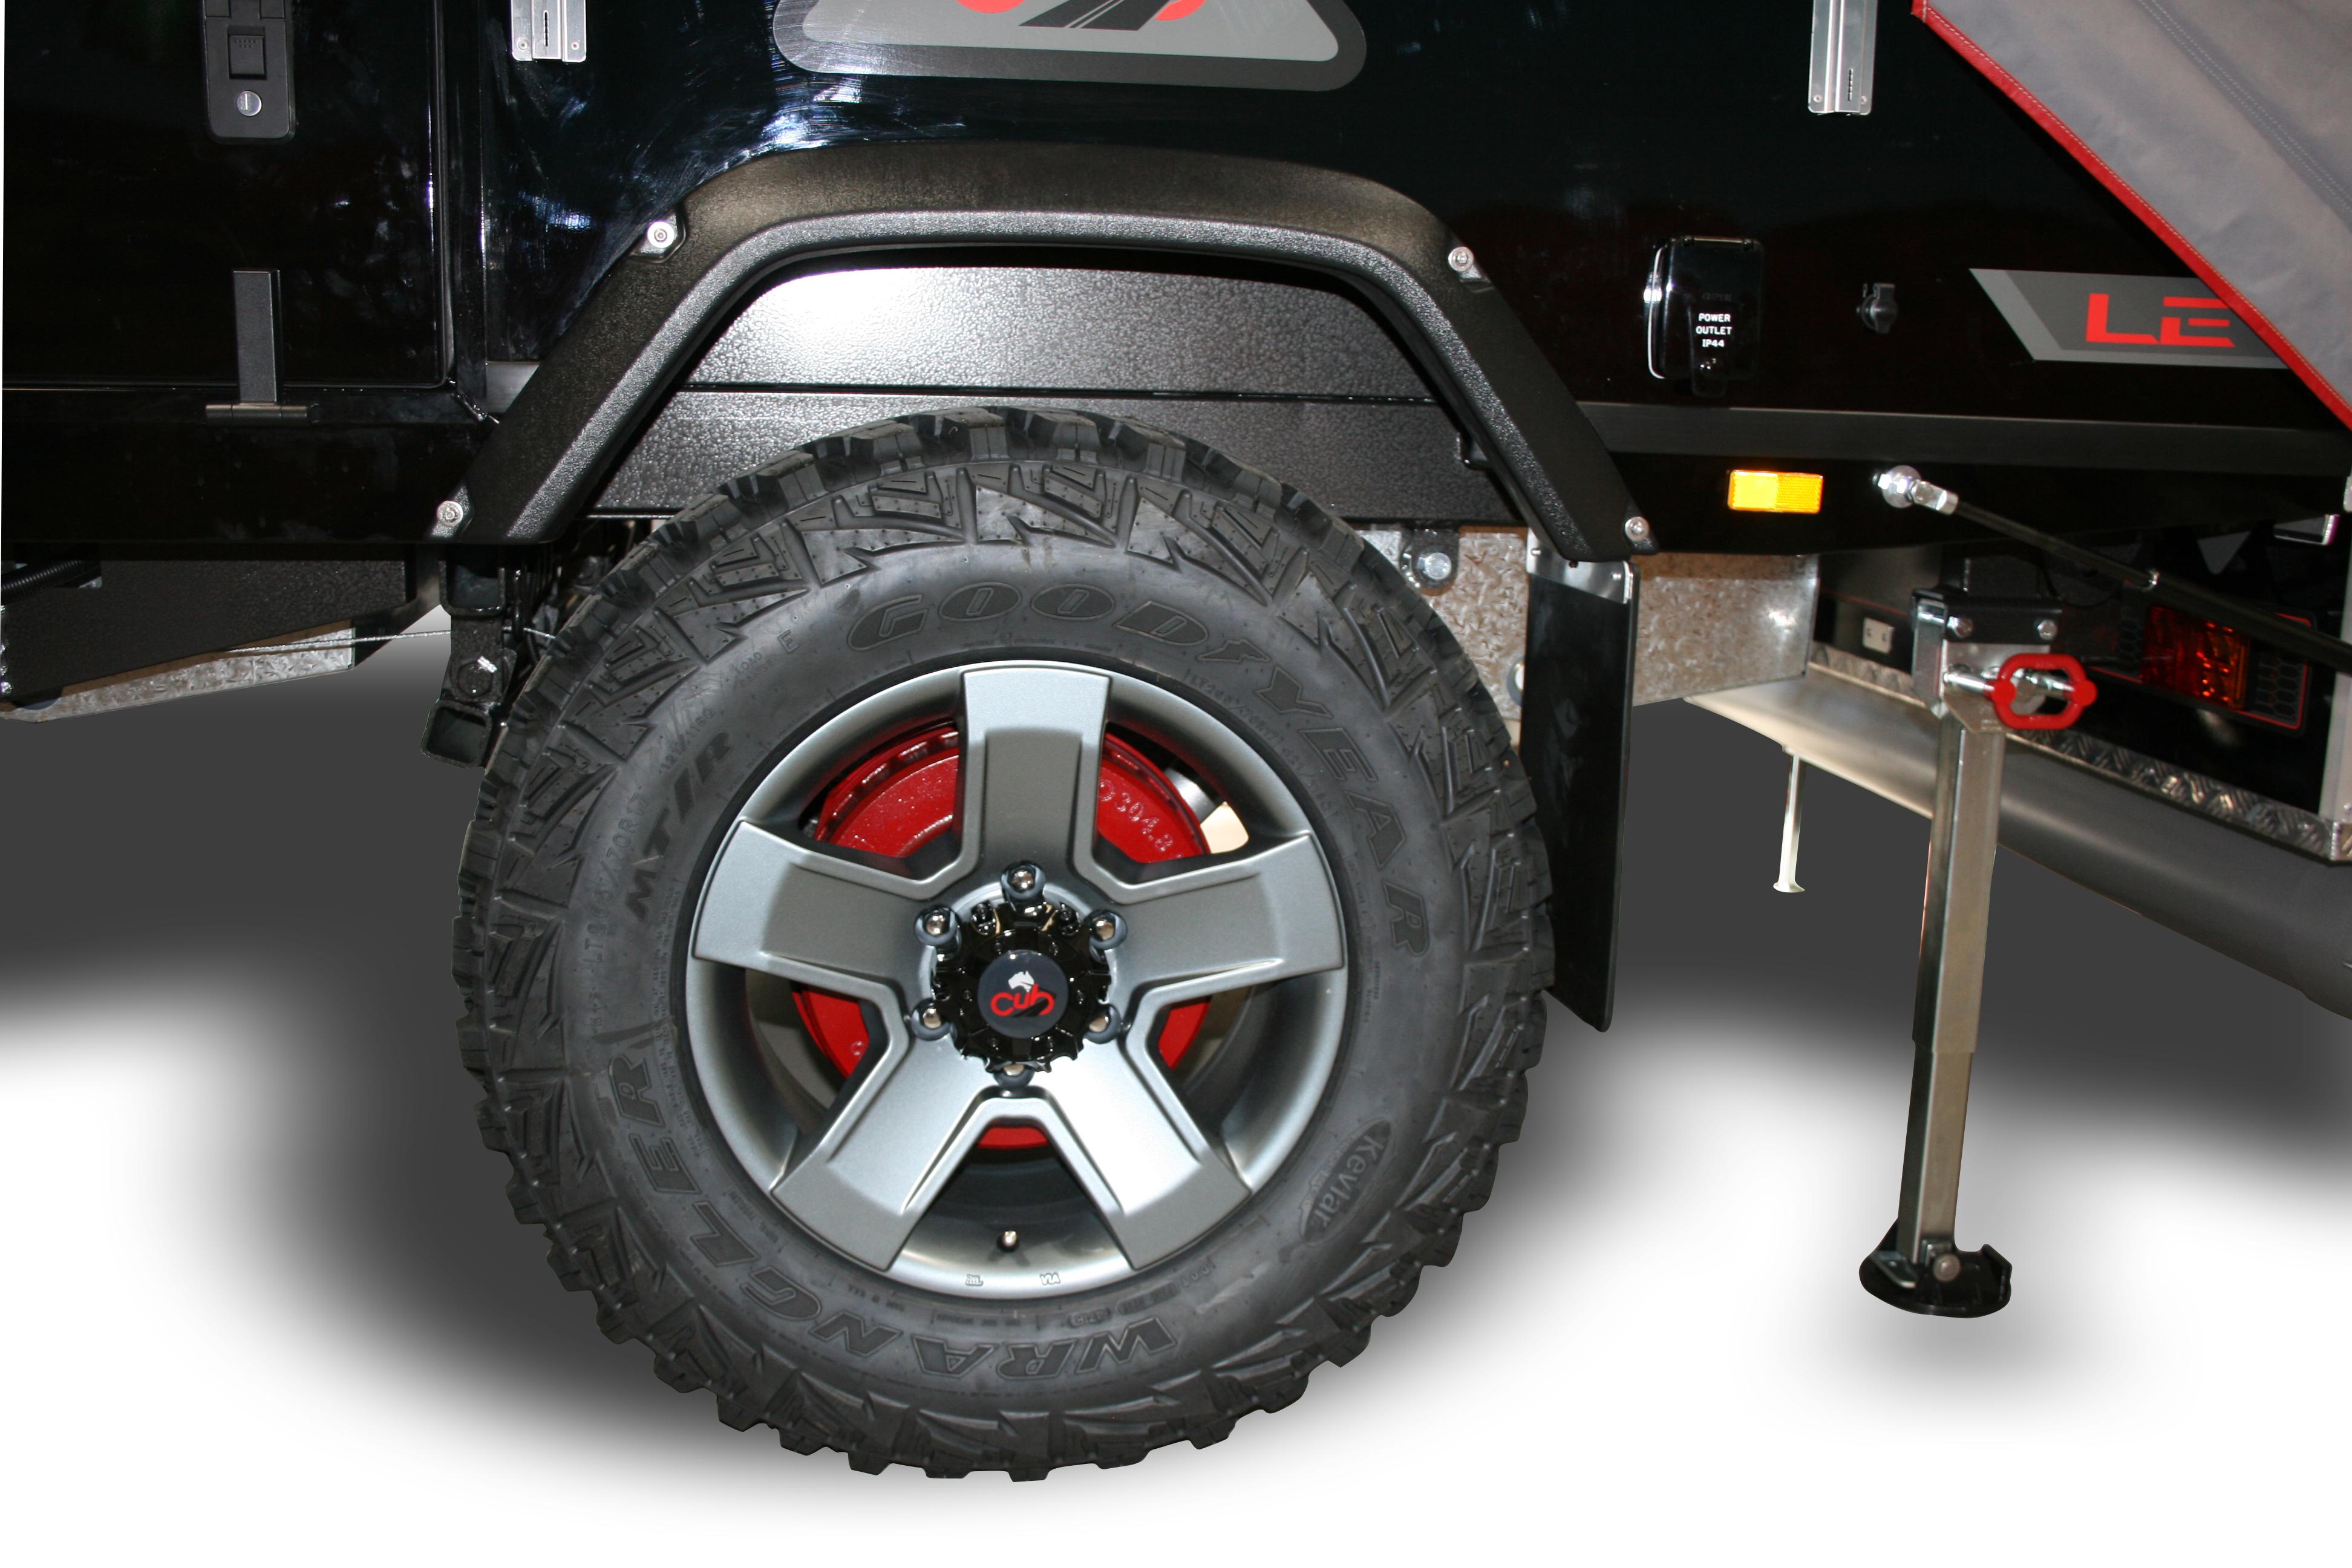 265/70R17 Alloy Gun Metal Wheels and Goodyear Mud Terrain Tyres